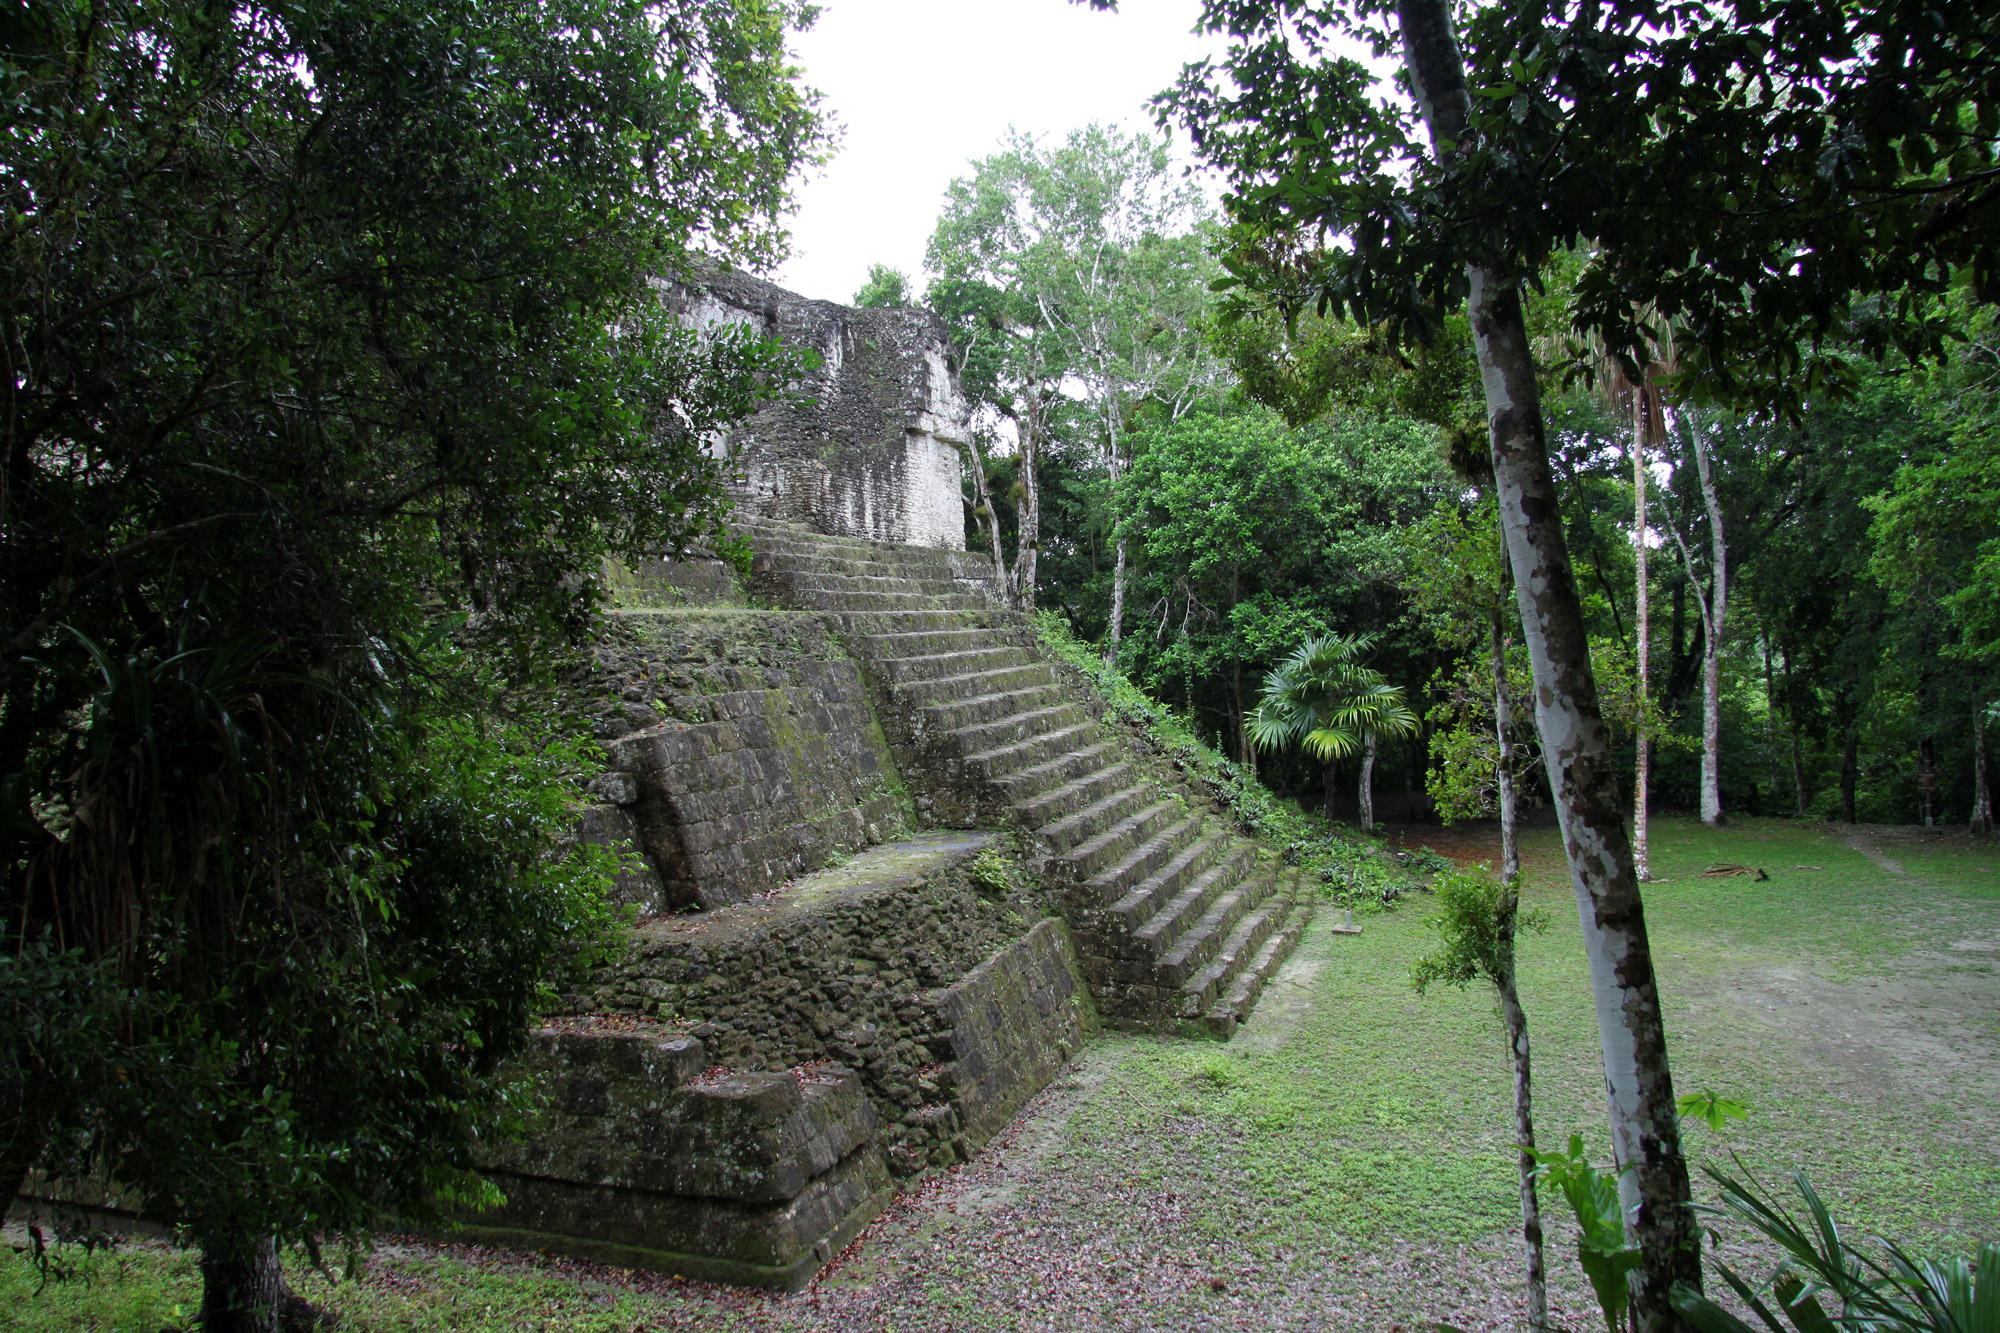 Guatemala 2015 - dag 8 - Tweede dag in Tikal